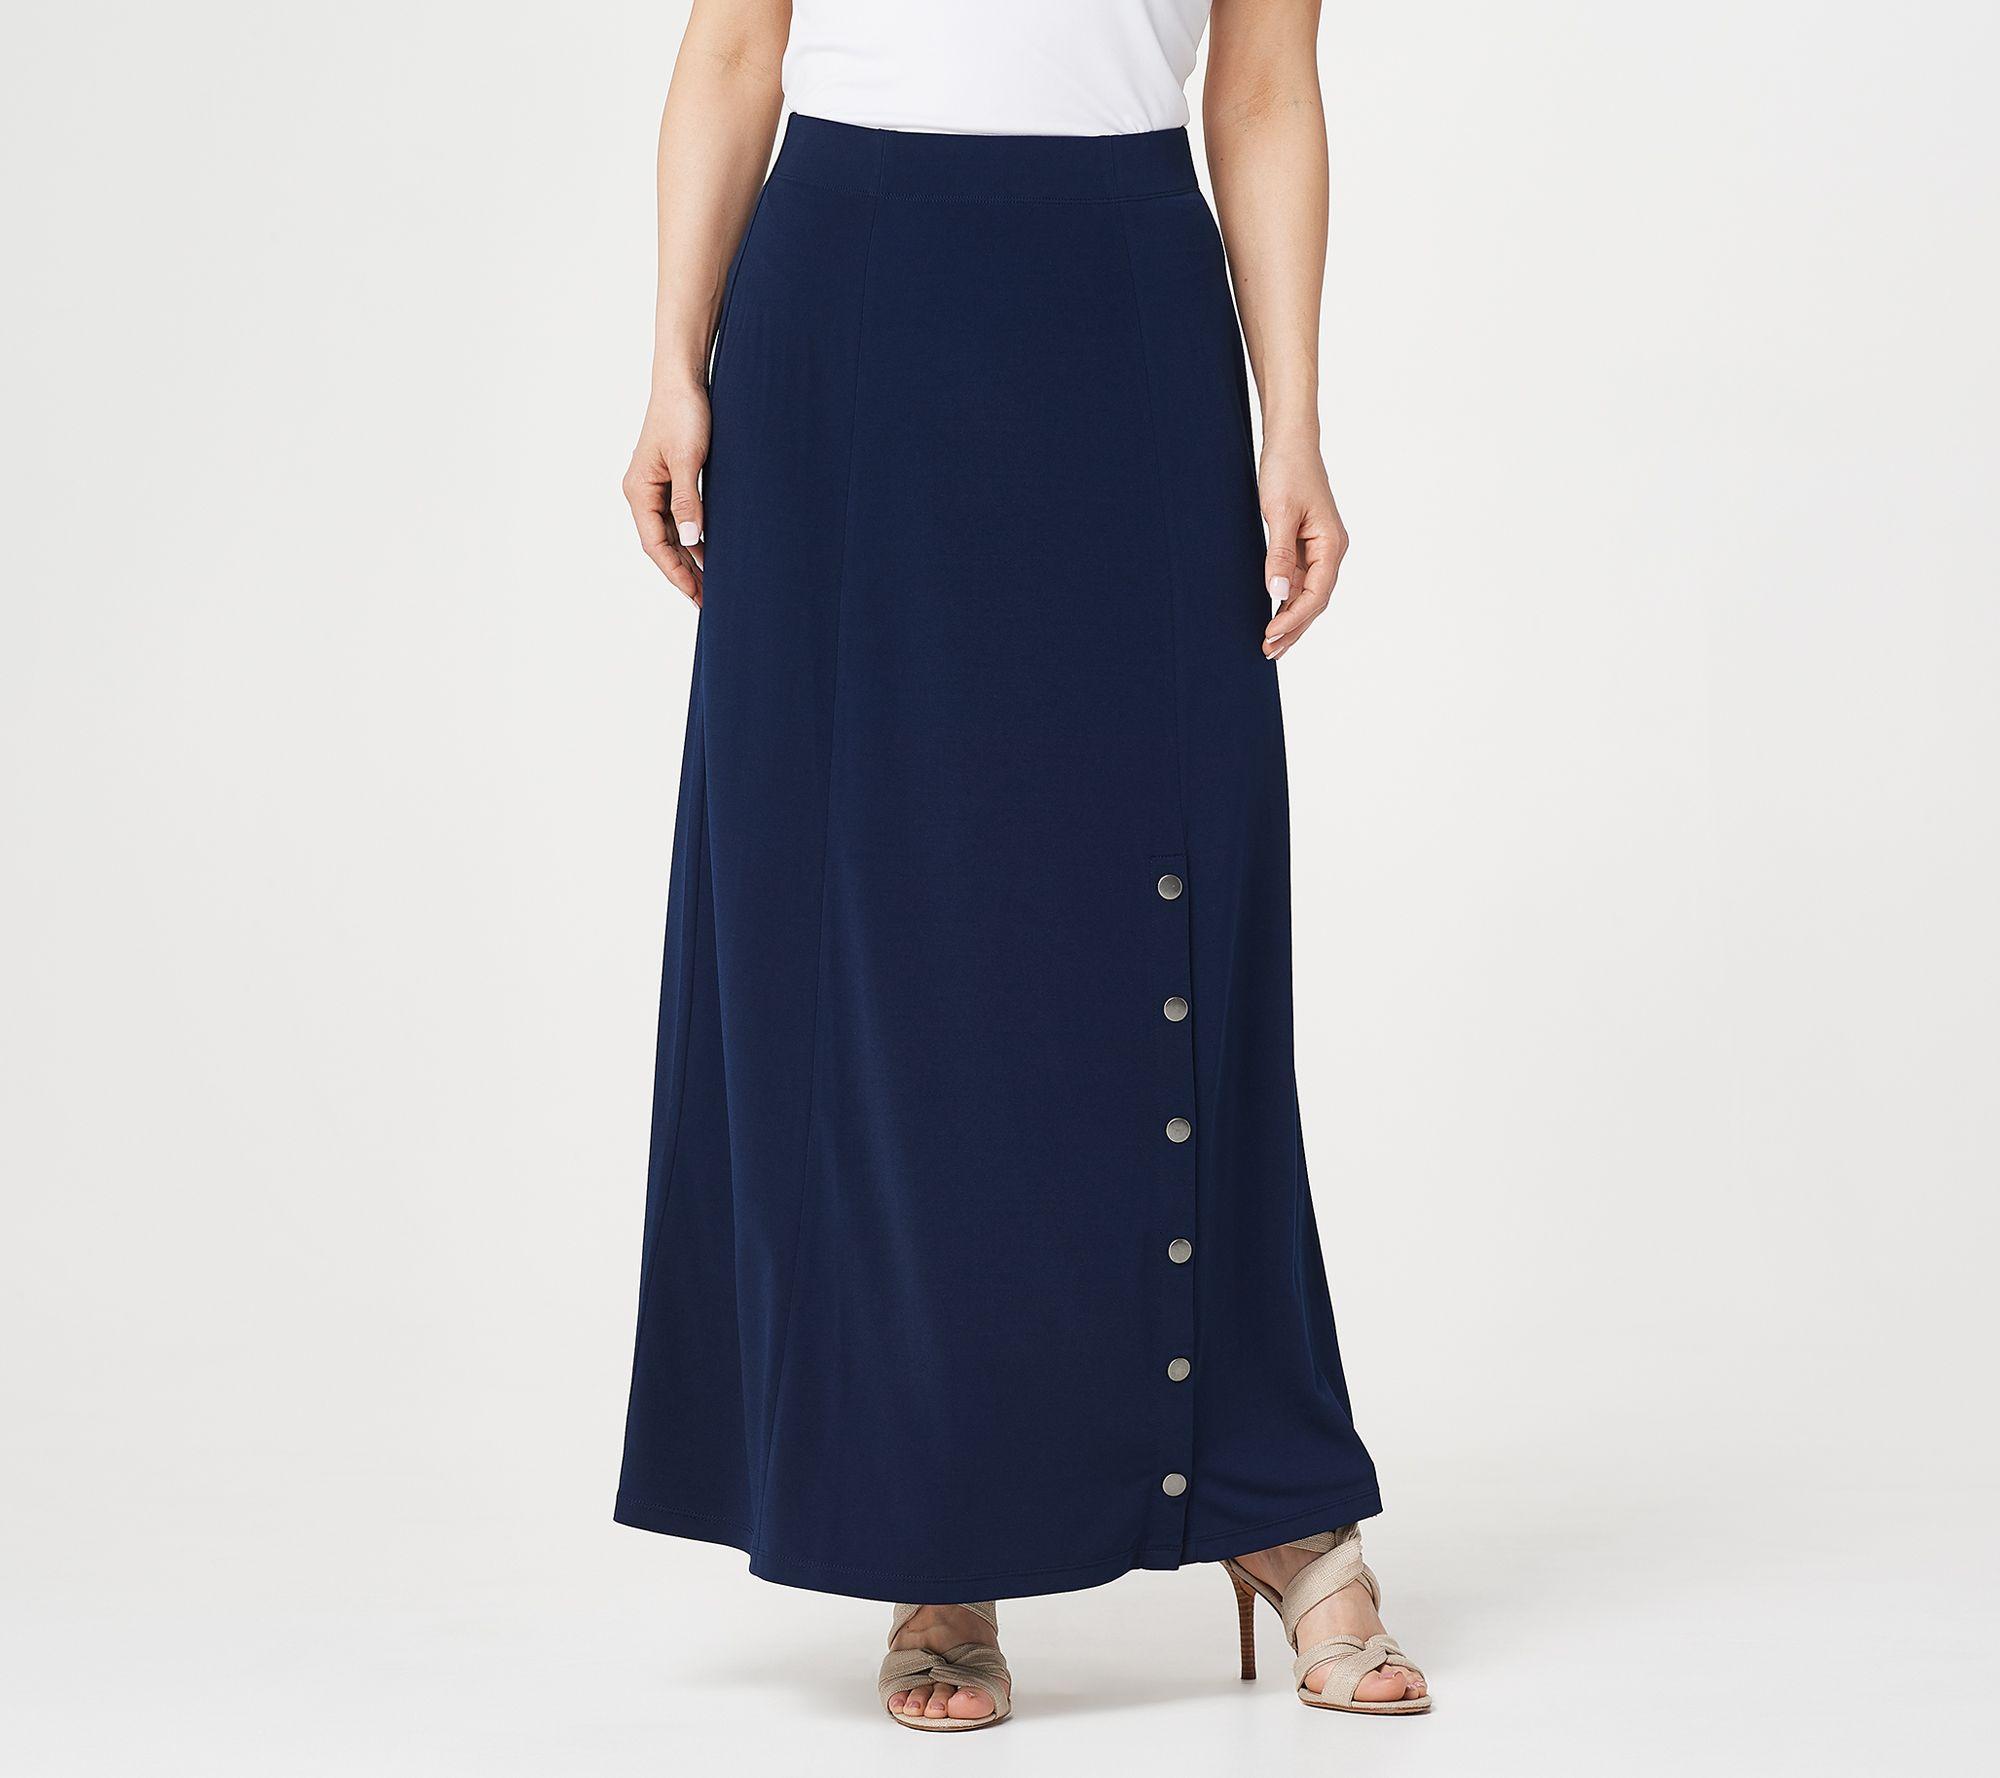 Abiti Da Sera Qvc.The1855 Susan Graver Printed Liquid Knit Six Gore Maxi Skirt With